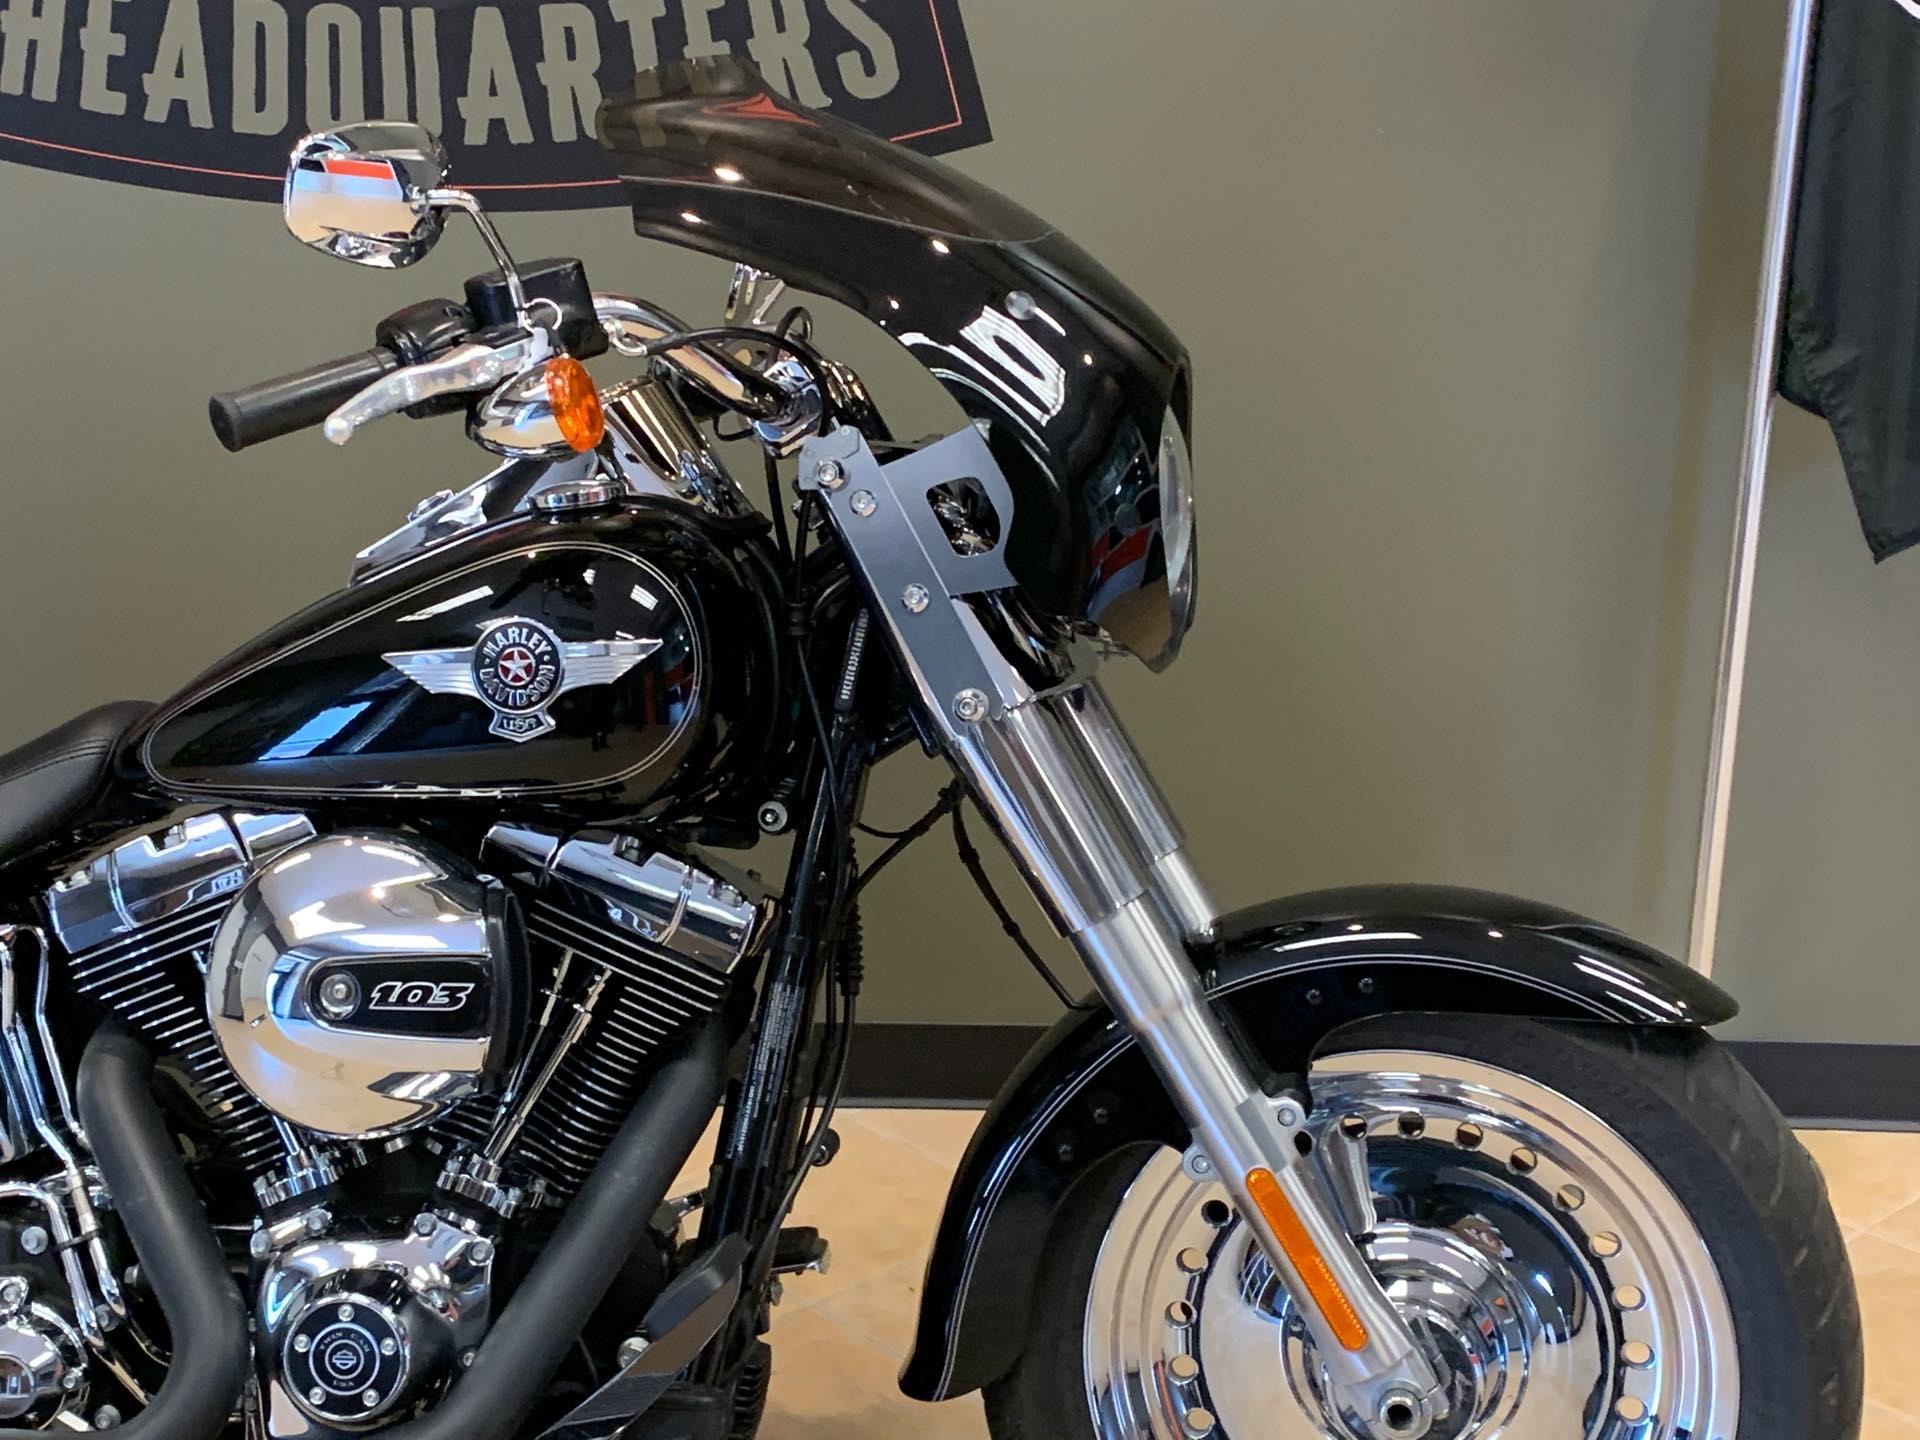 2016 Harley-Davidson Softail Fat Boy at Loess Hills Harley-Davidson